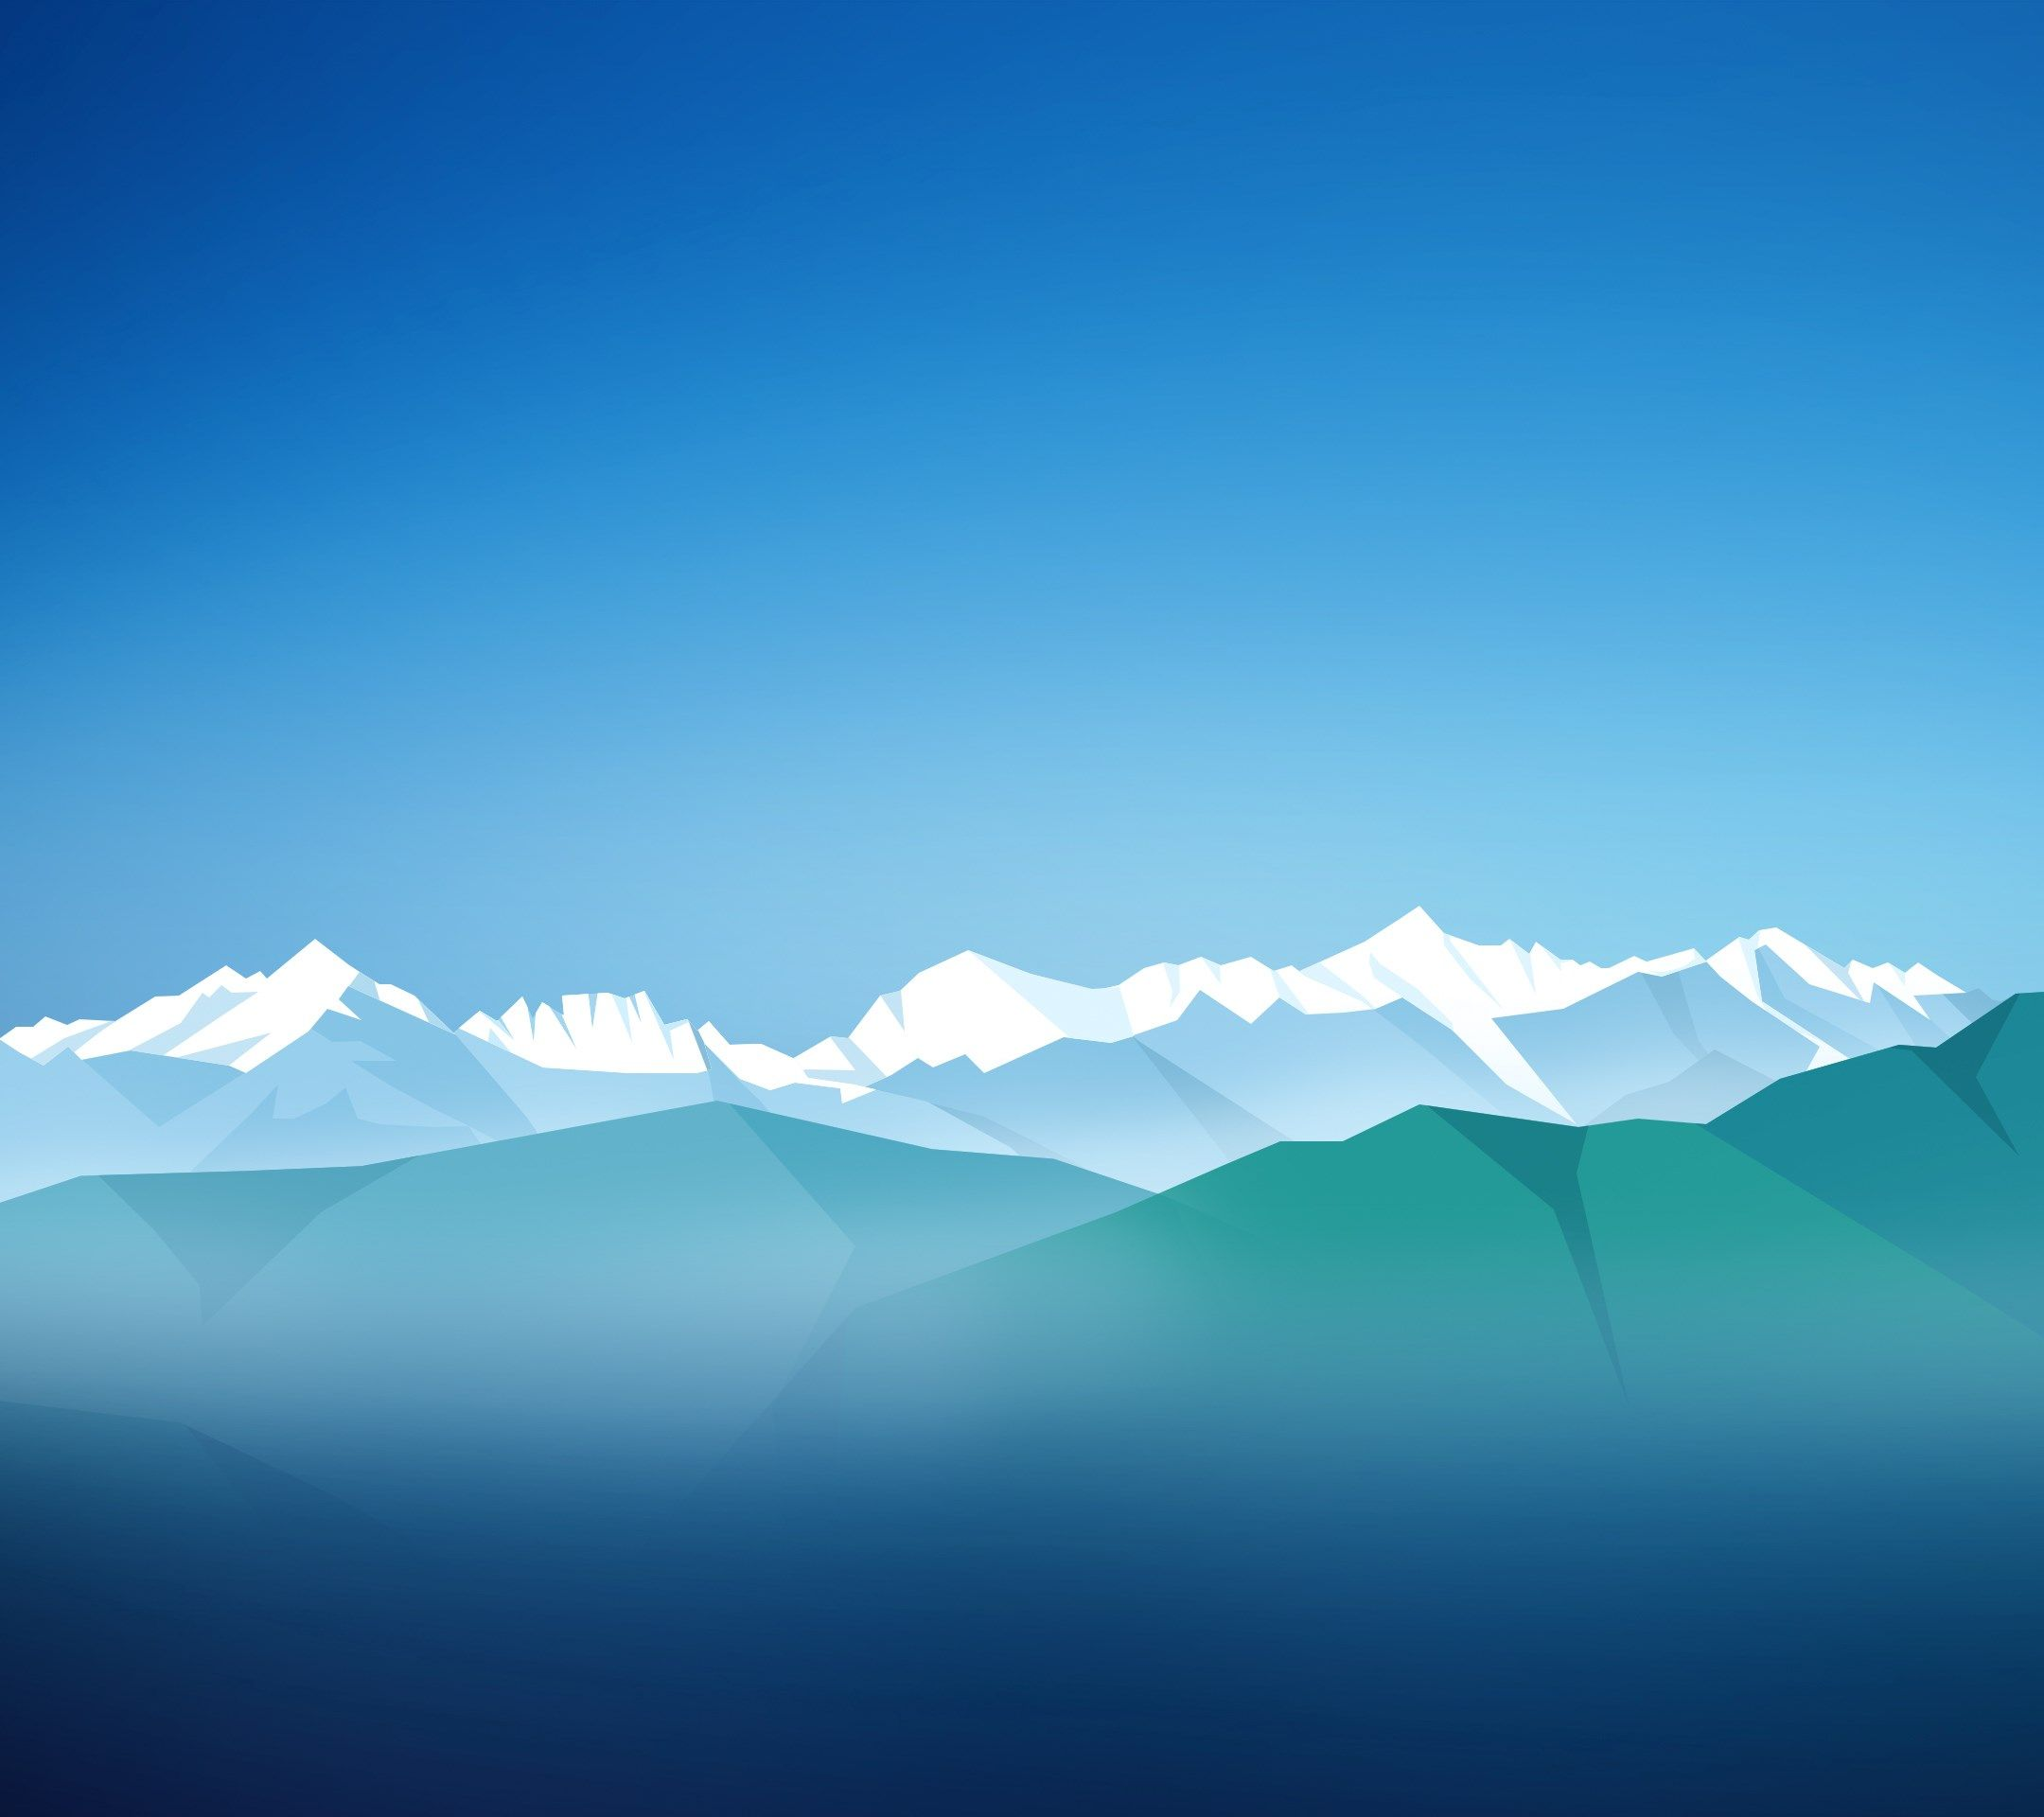 Wonderful Wallpaper Logo Huawei - 6eb85740f3747f047b316603f6ff2159  Perfect Image Reference_553675.jpg